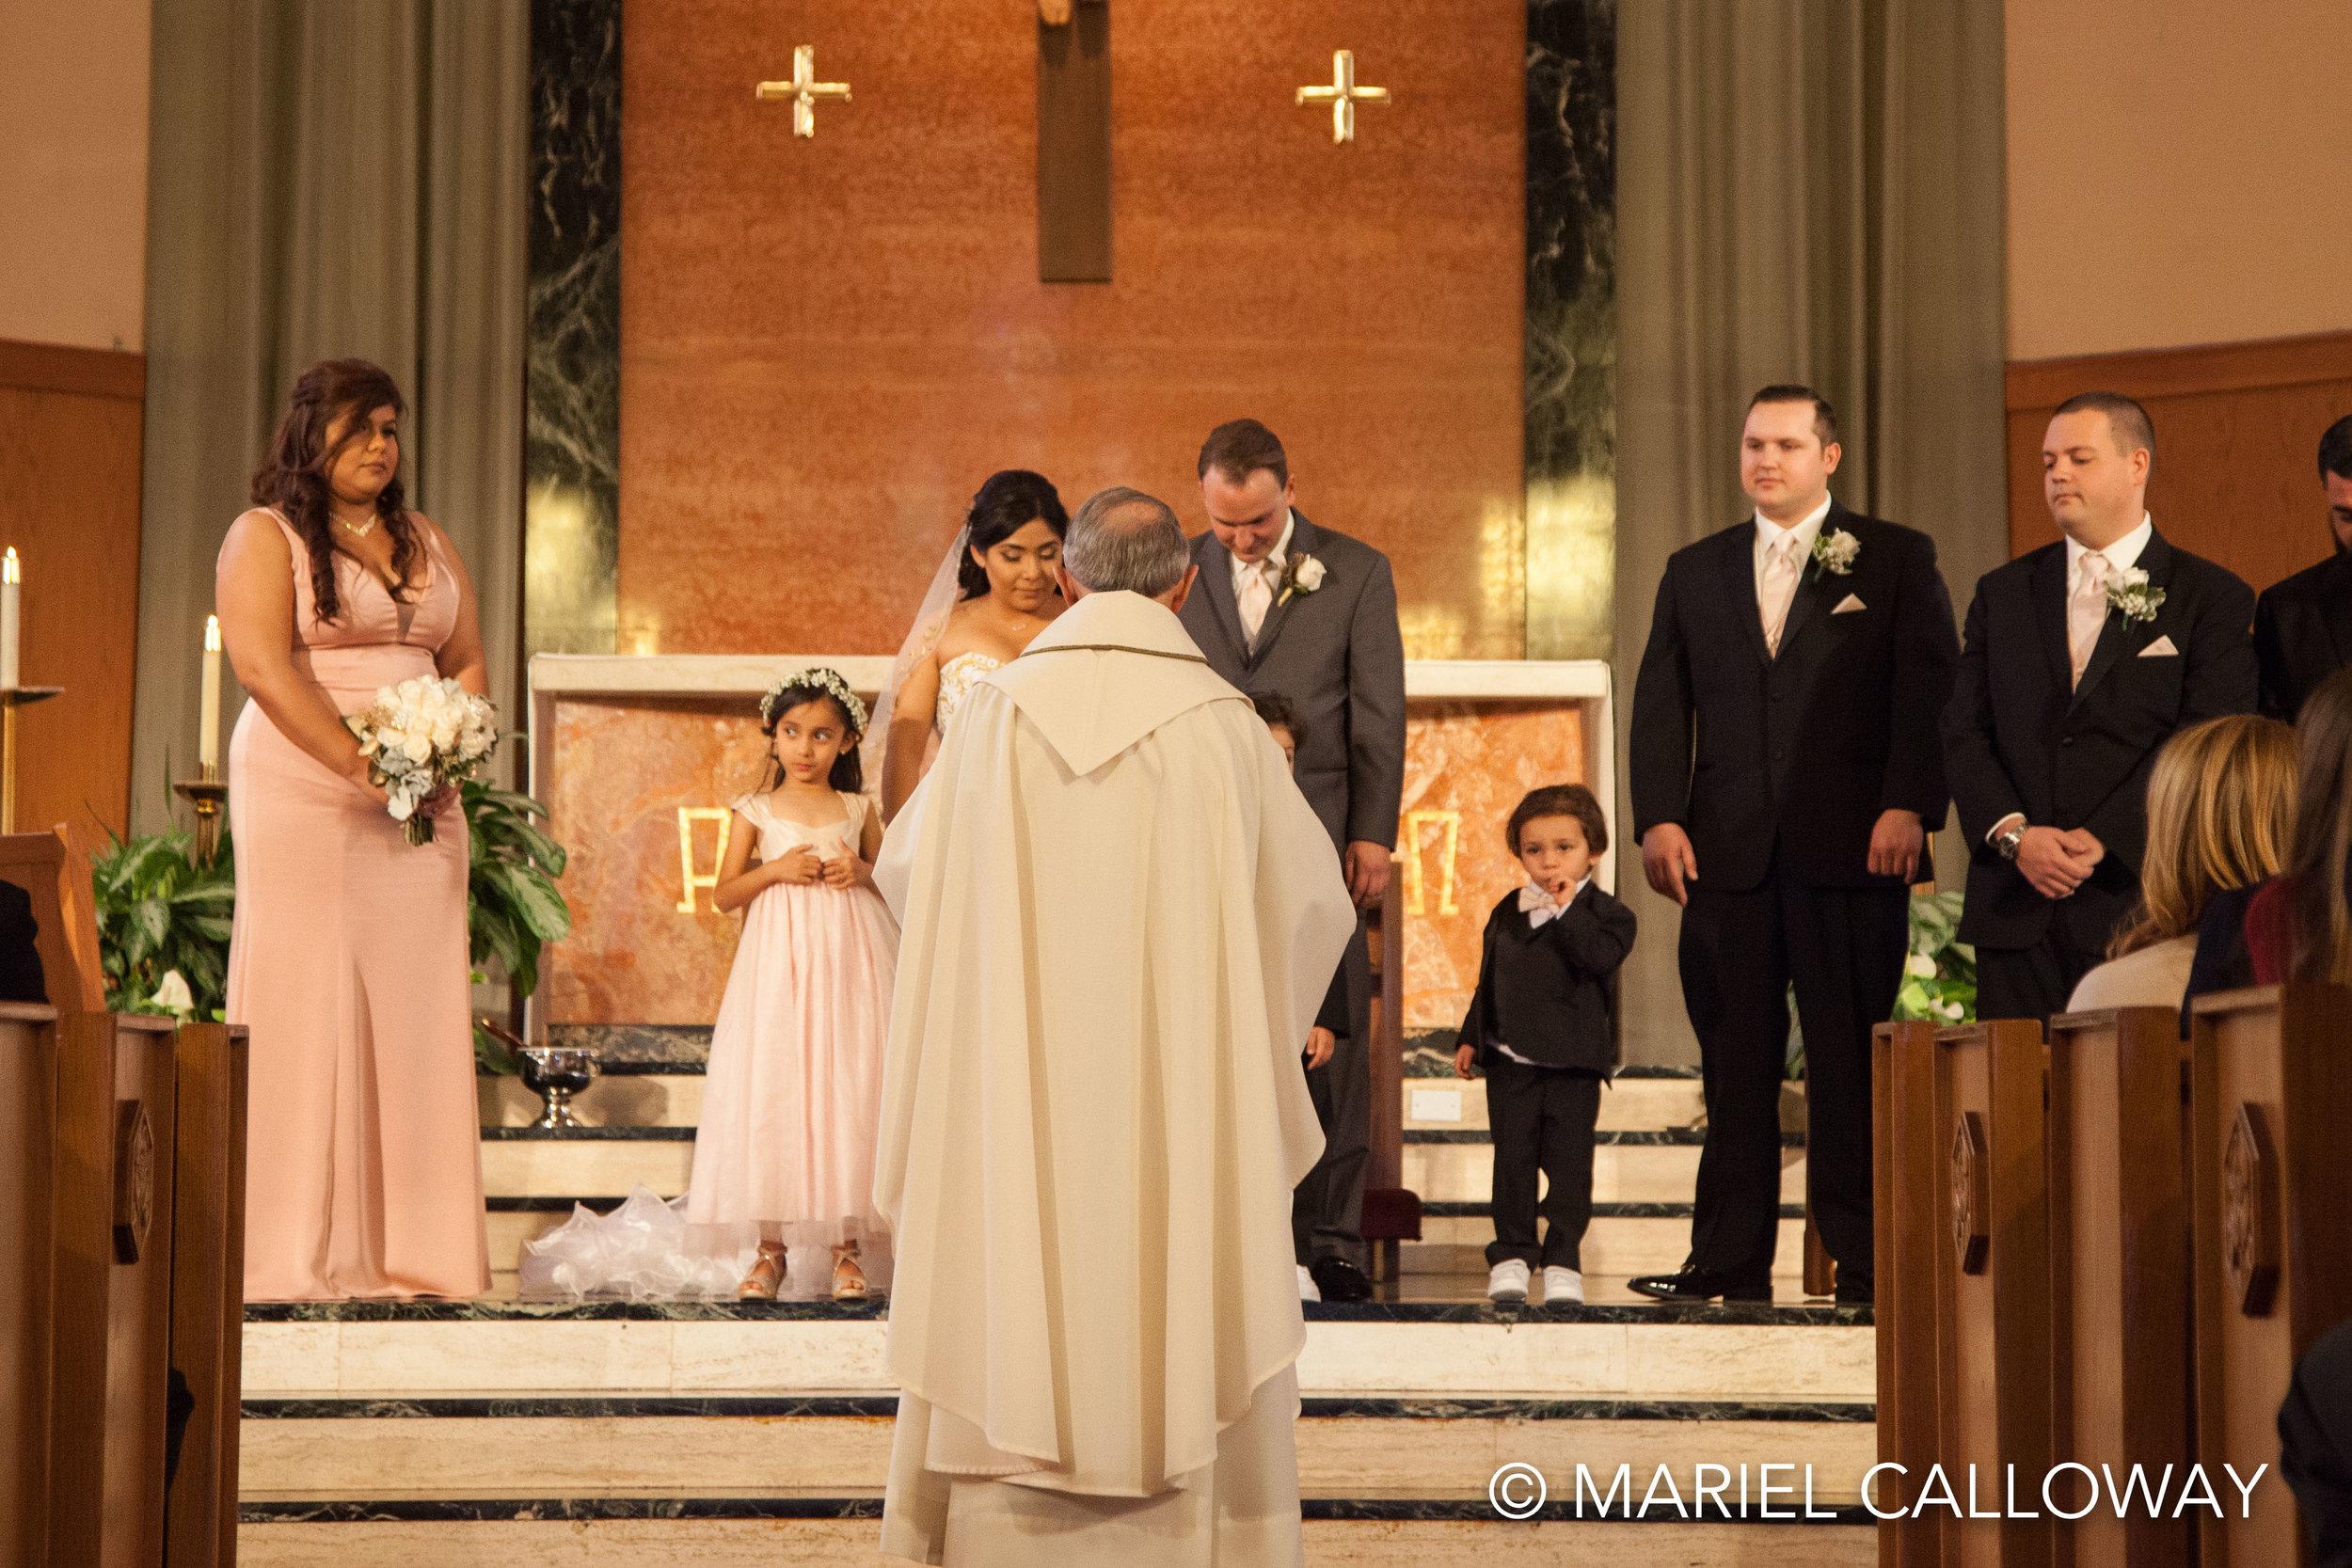 Mariel-Calloway-Los-Angeles-Wedding-Photography-Rossi-47.jpg